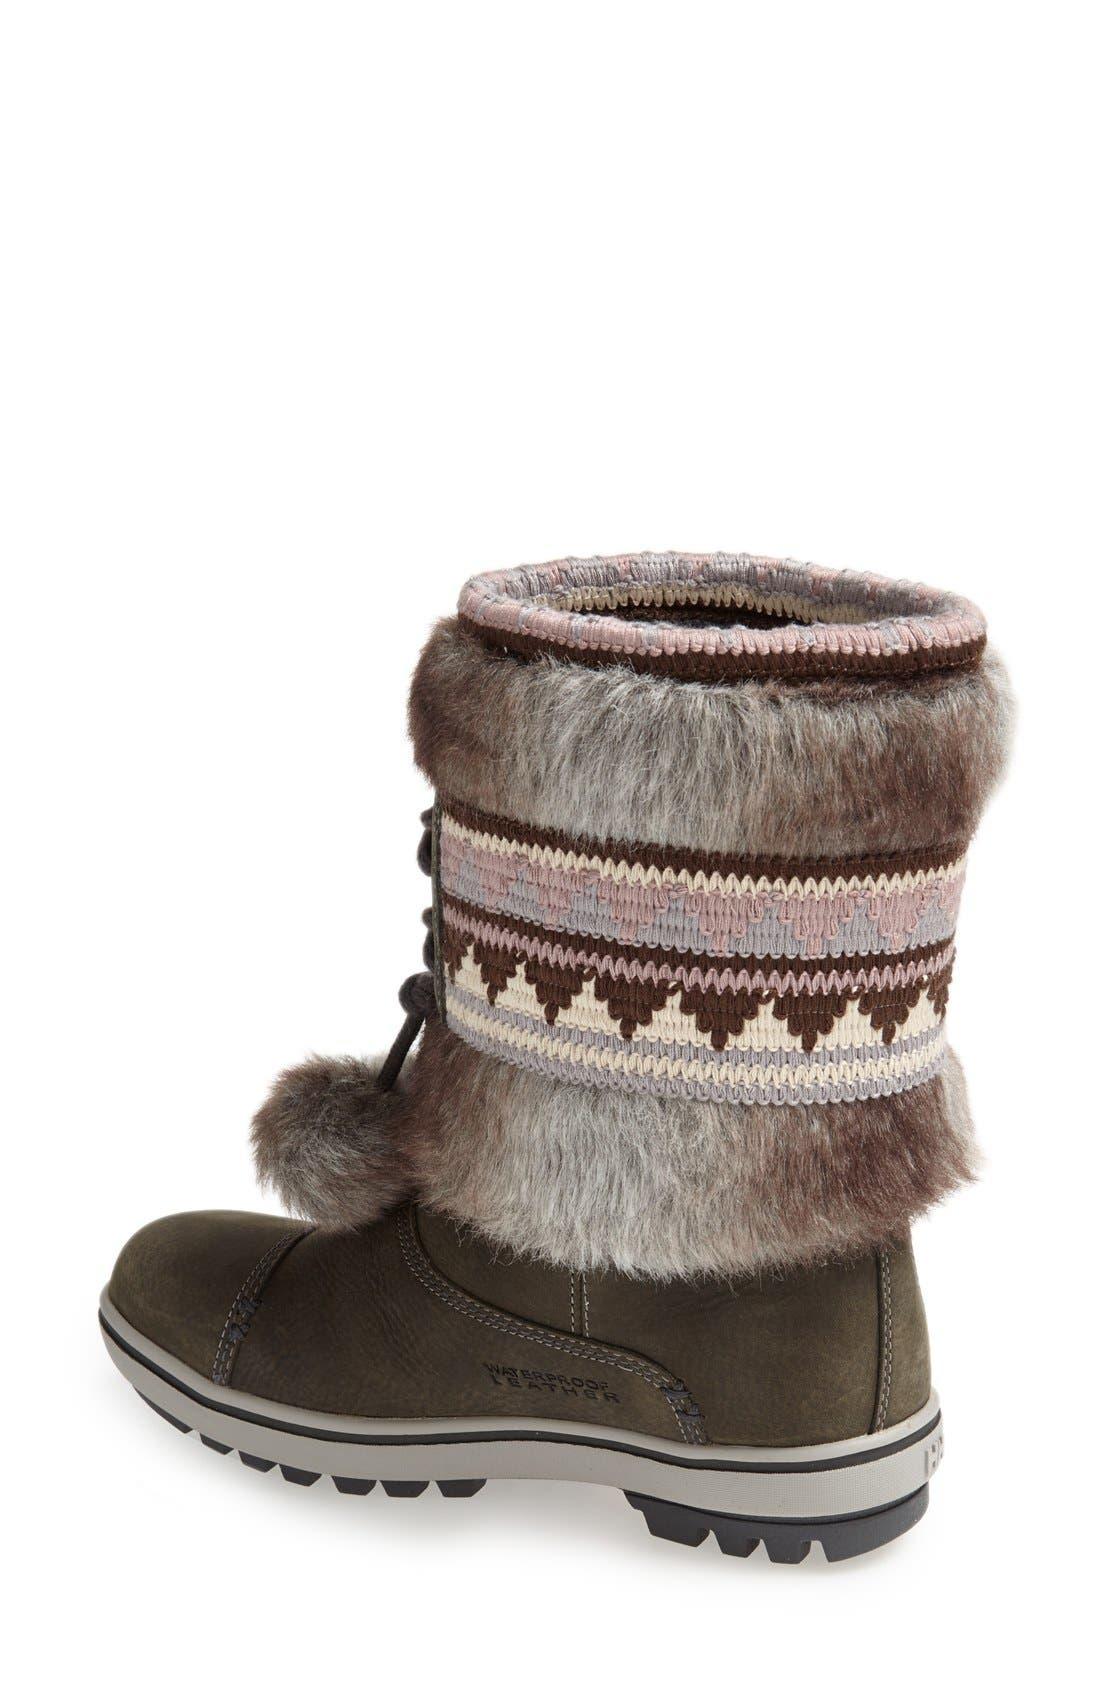 Alternate Image 2  - Helly Hansen 'Iskoras' Waterproof Leather Snow Boot (Women)